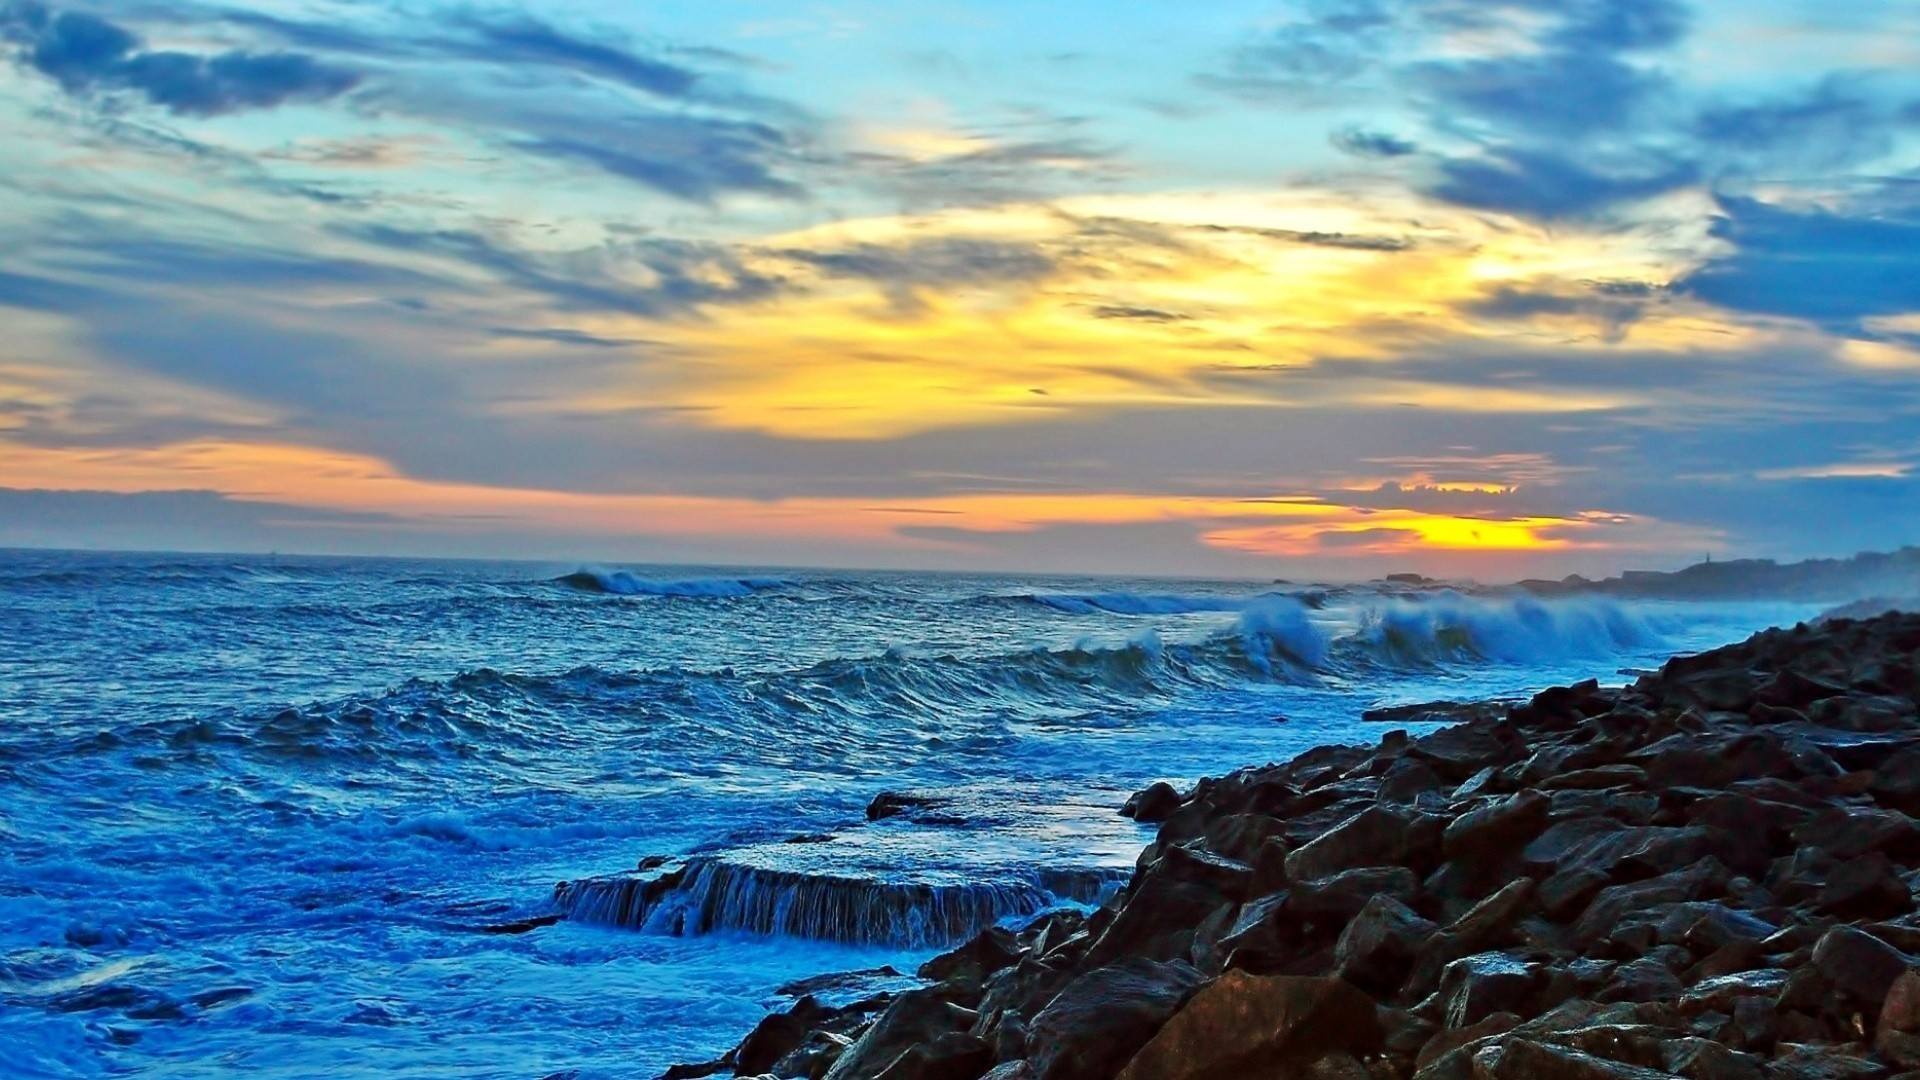 Goa Beach Parallax Hd Iphone Ipad Wallpaper: Beach IPhone Wallpaper HD (90+ Images